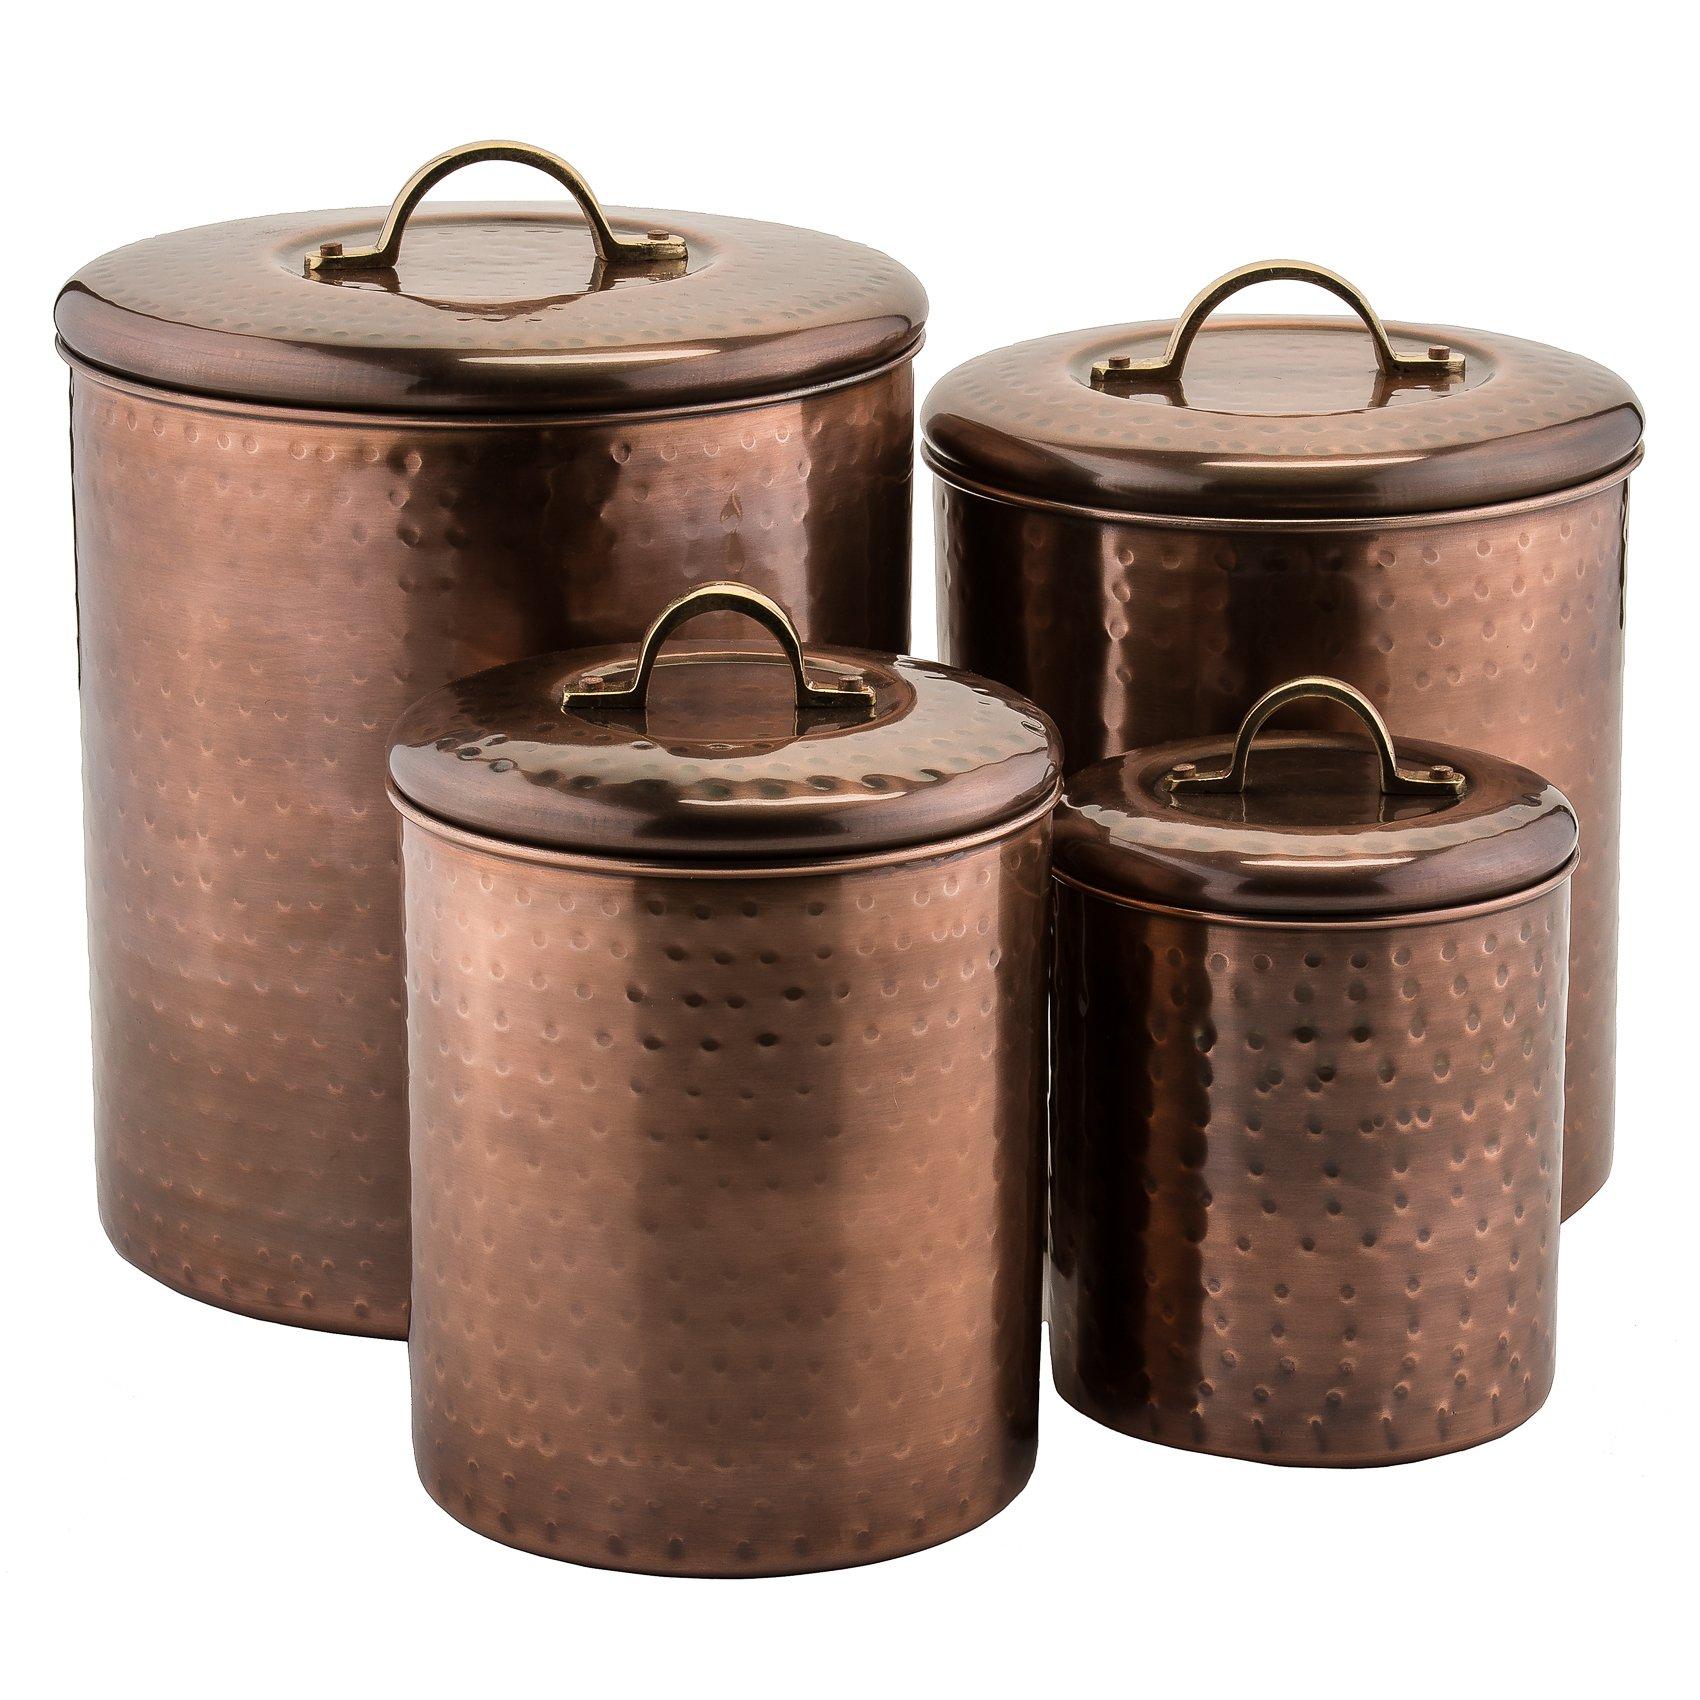 Old Dutch 1843 Old Dutch Hammered Canister (Set of 4), Antique Copper, 4 quart/2 quart/1½ quart/1 quart